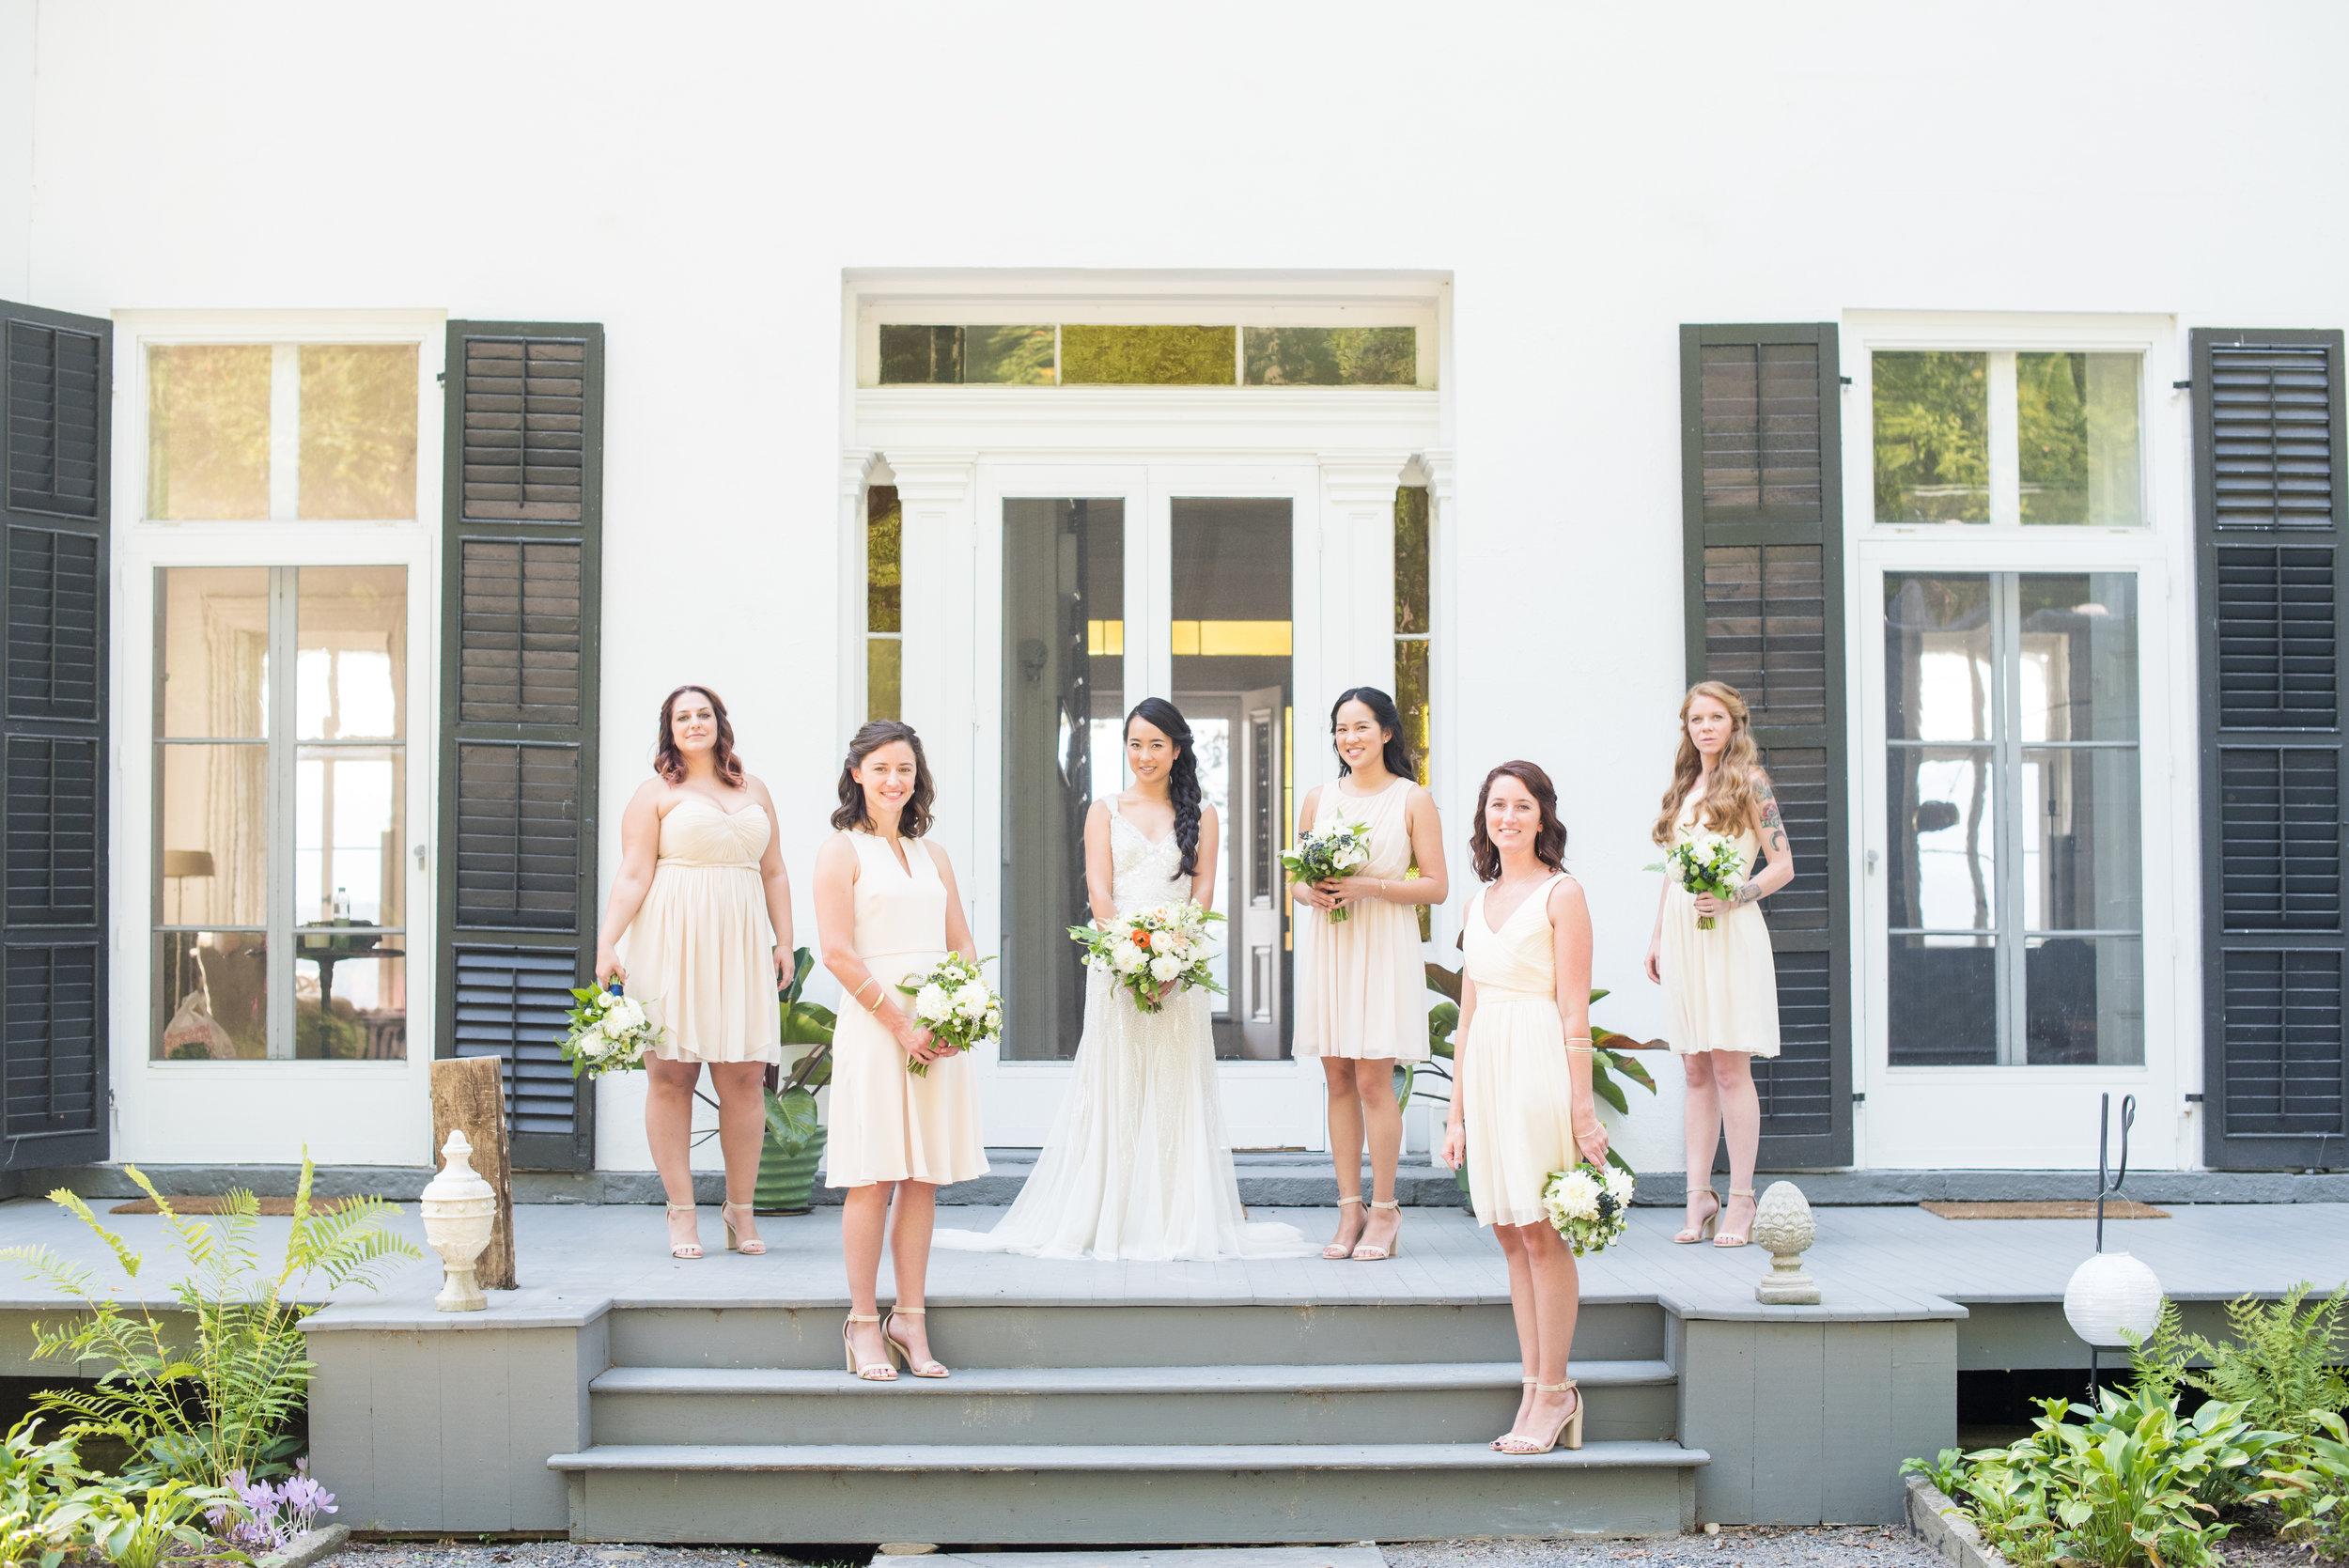 mikkelpaige-marisa_doug-wedding_party-003.jpg